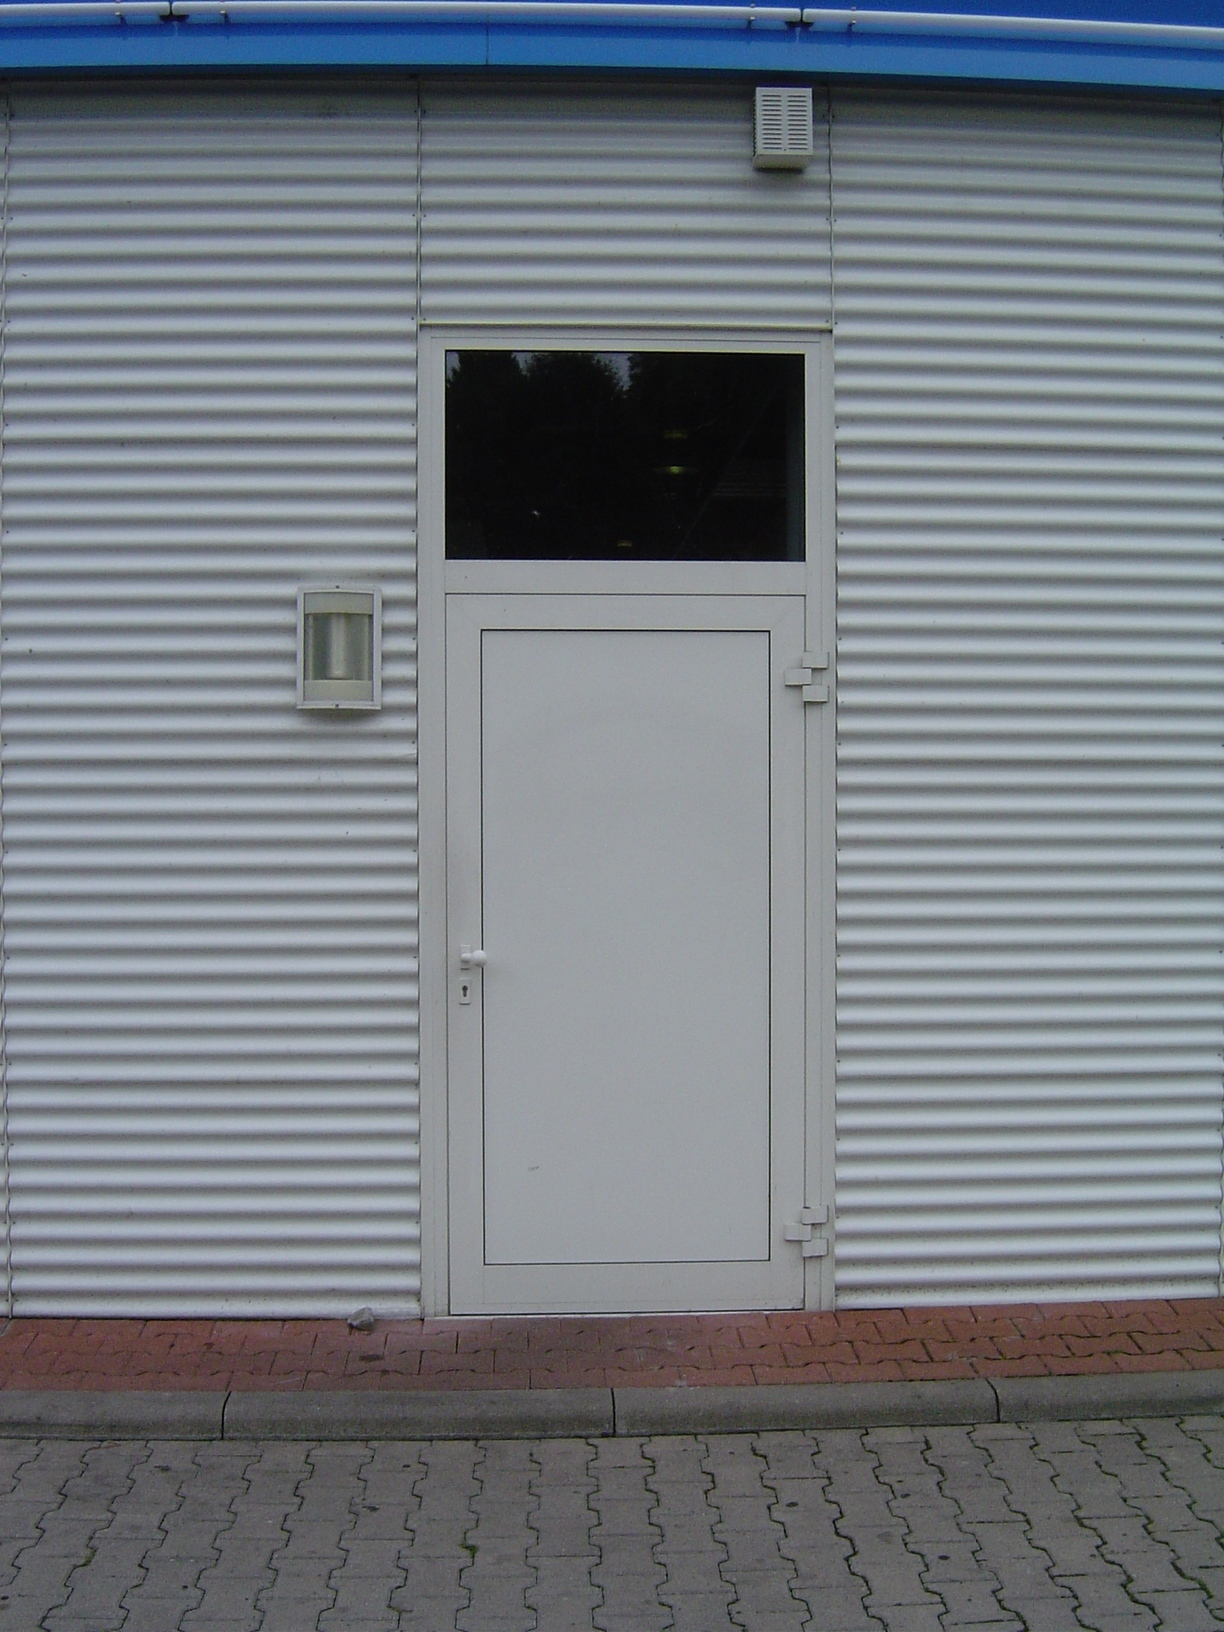 rigoletto steel plating walls texture door entrance modern